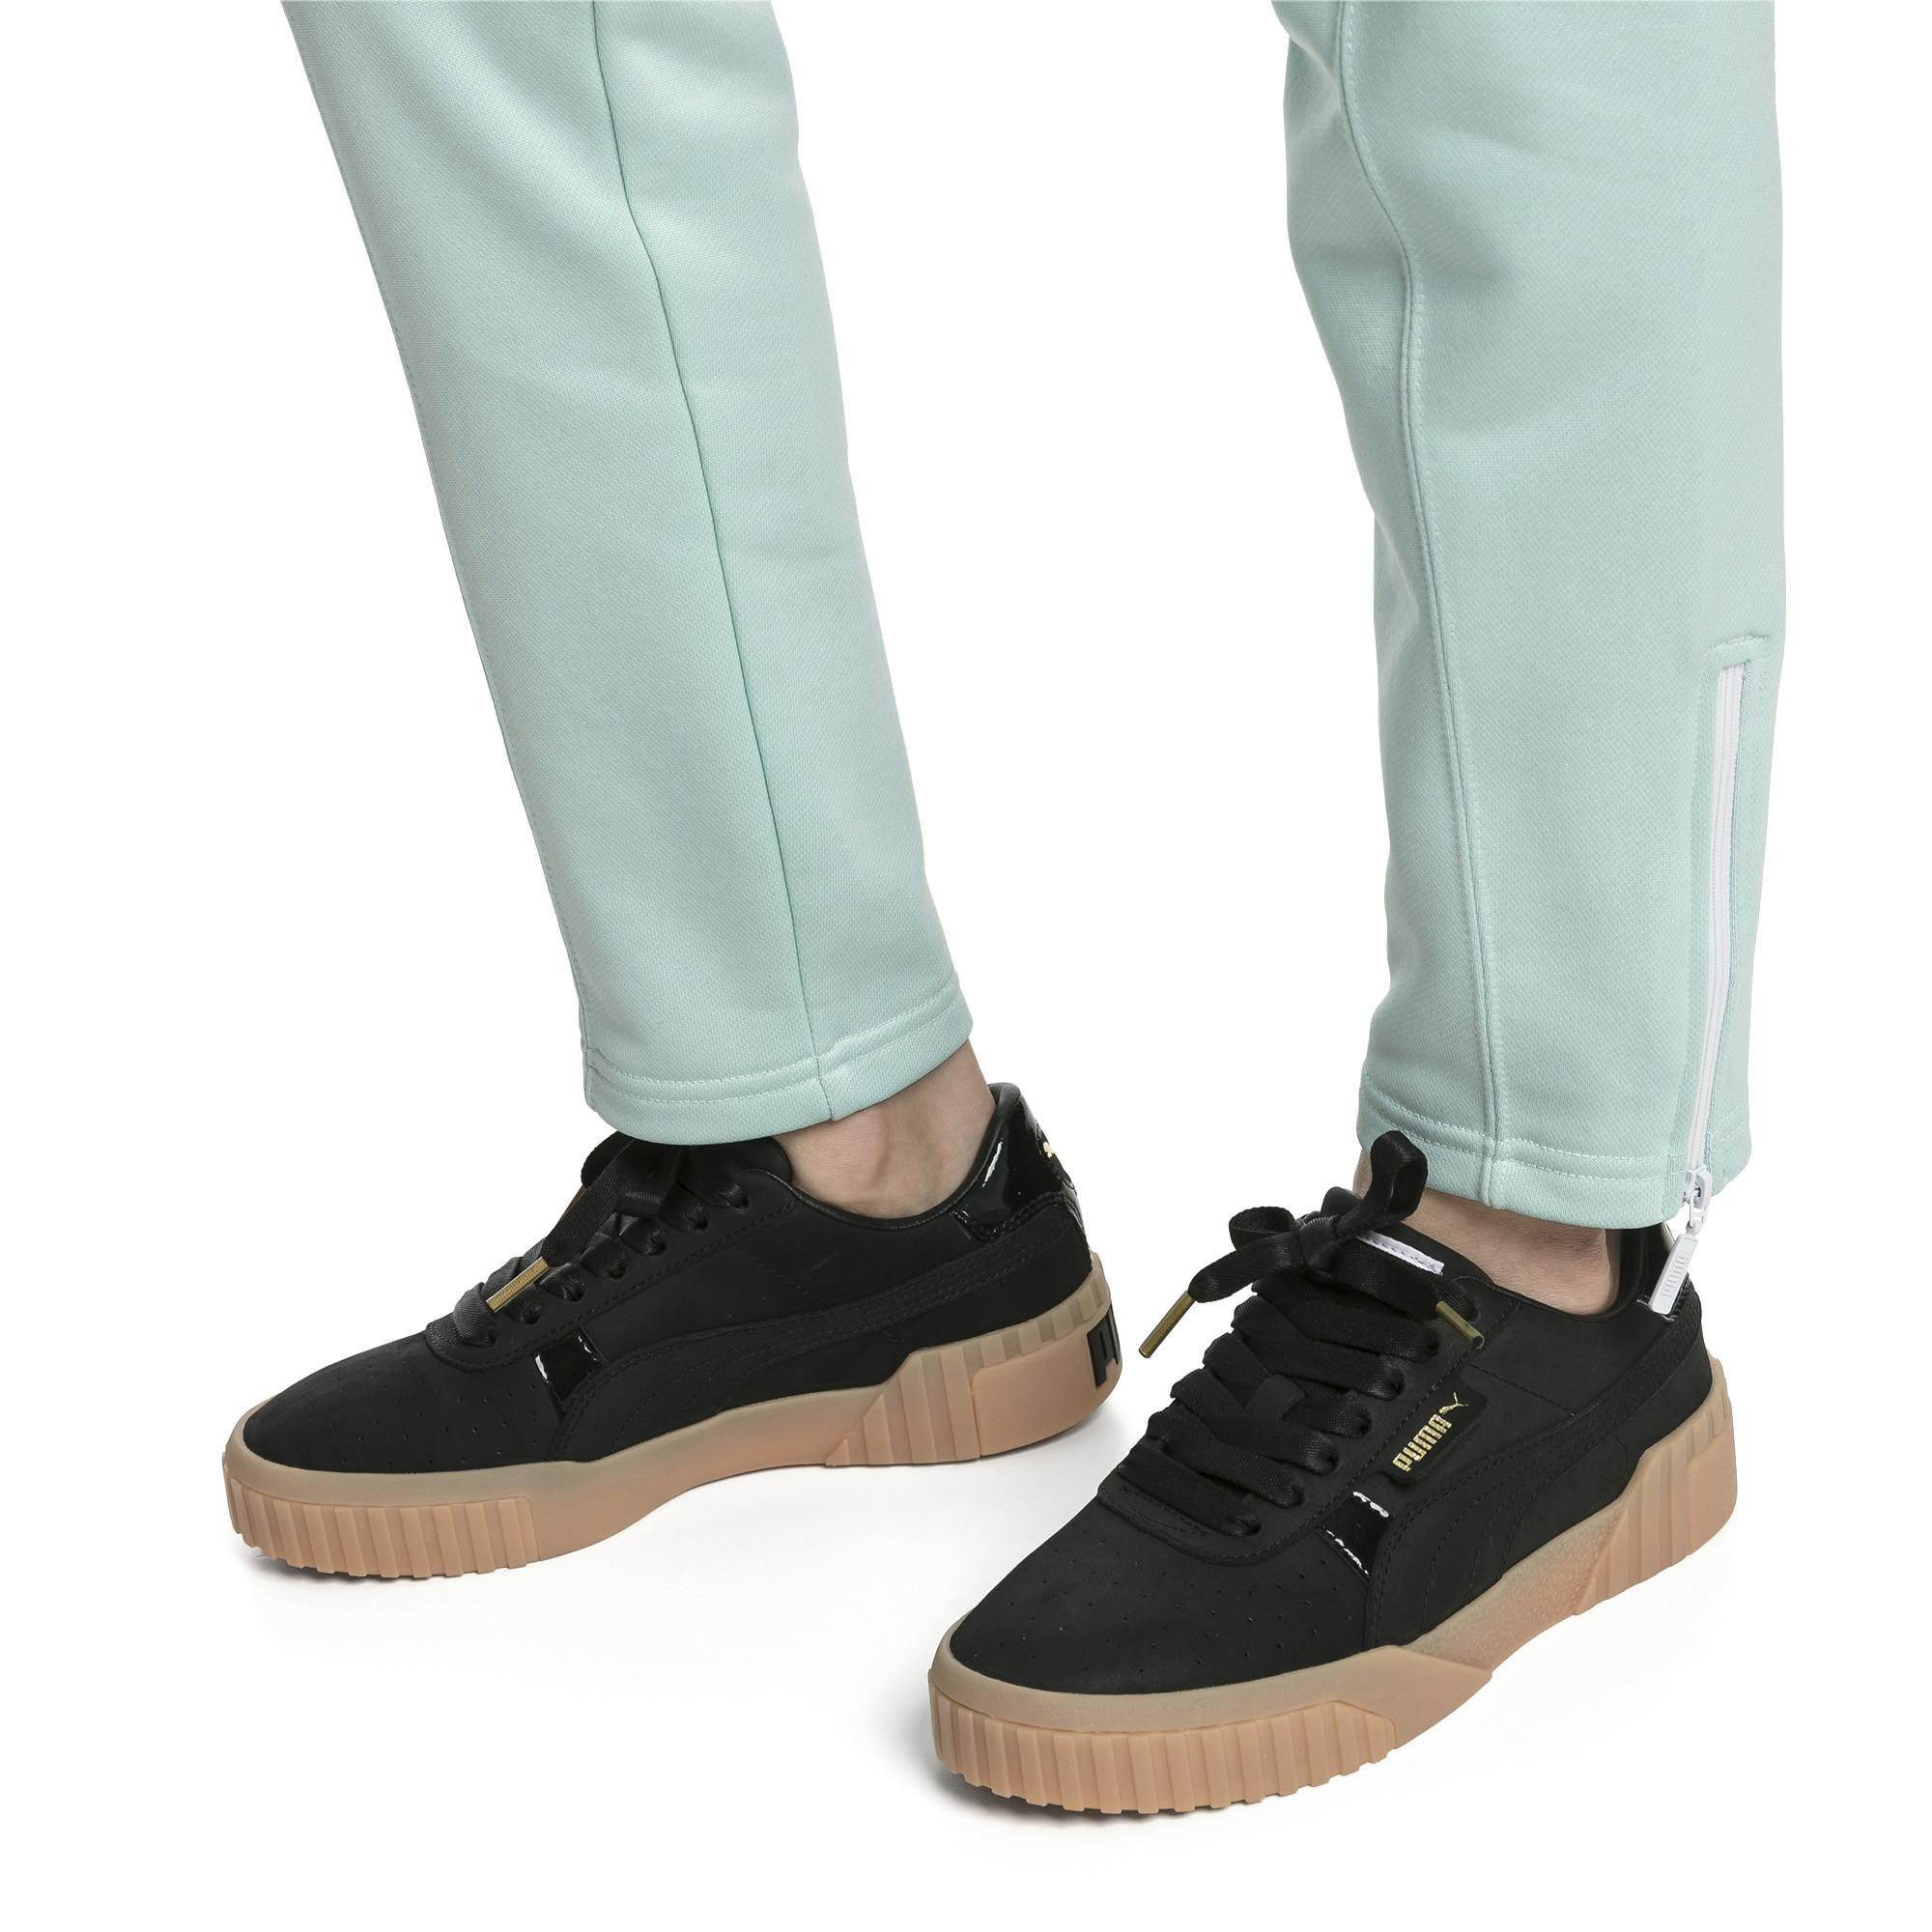 5dbc74d4b8 PUMA Black Cali Nubuck Women's Sneakers